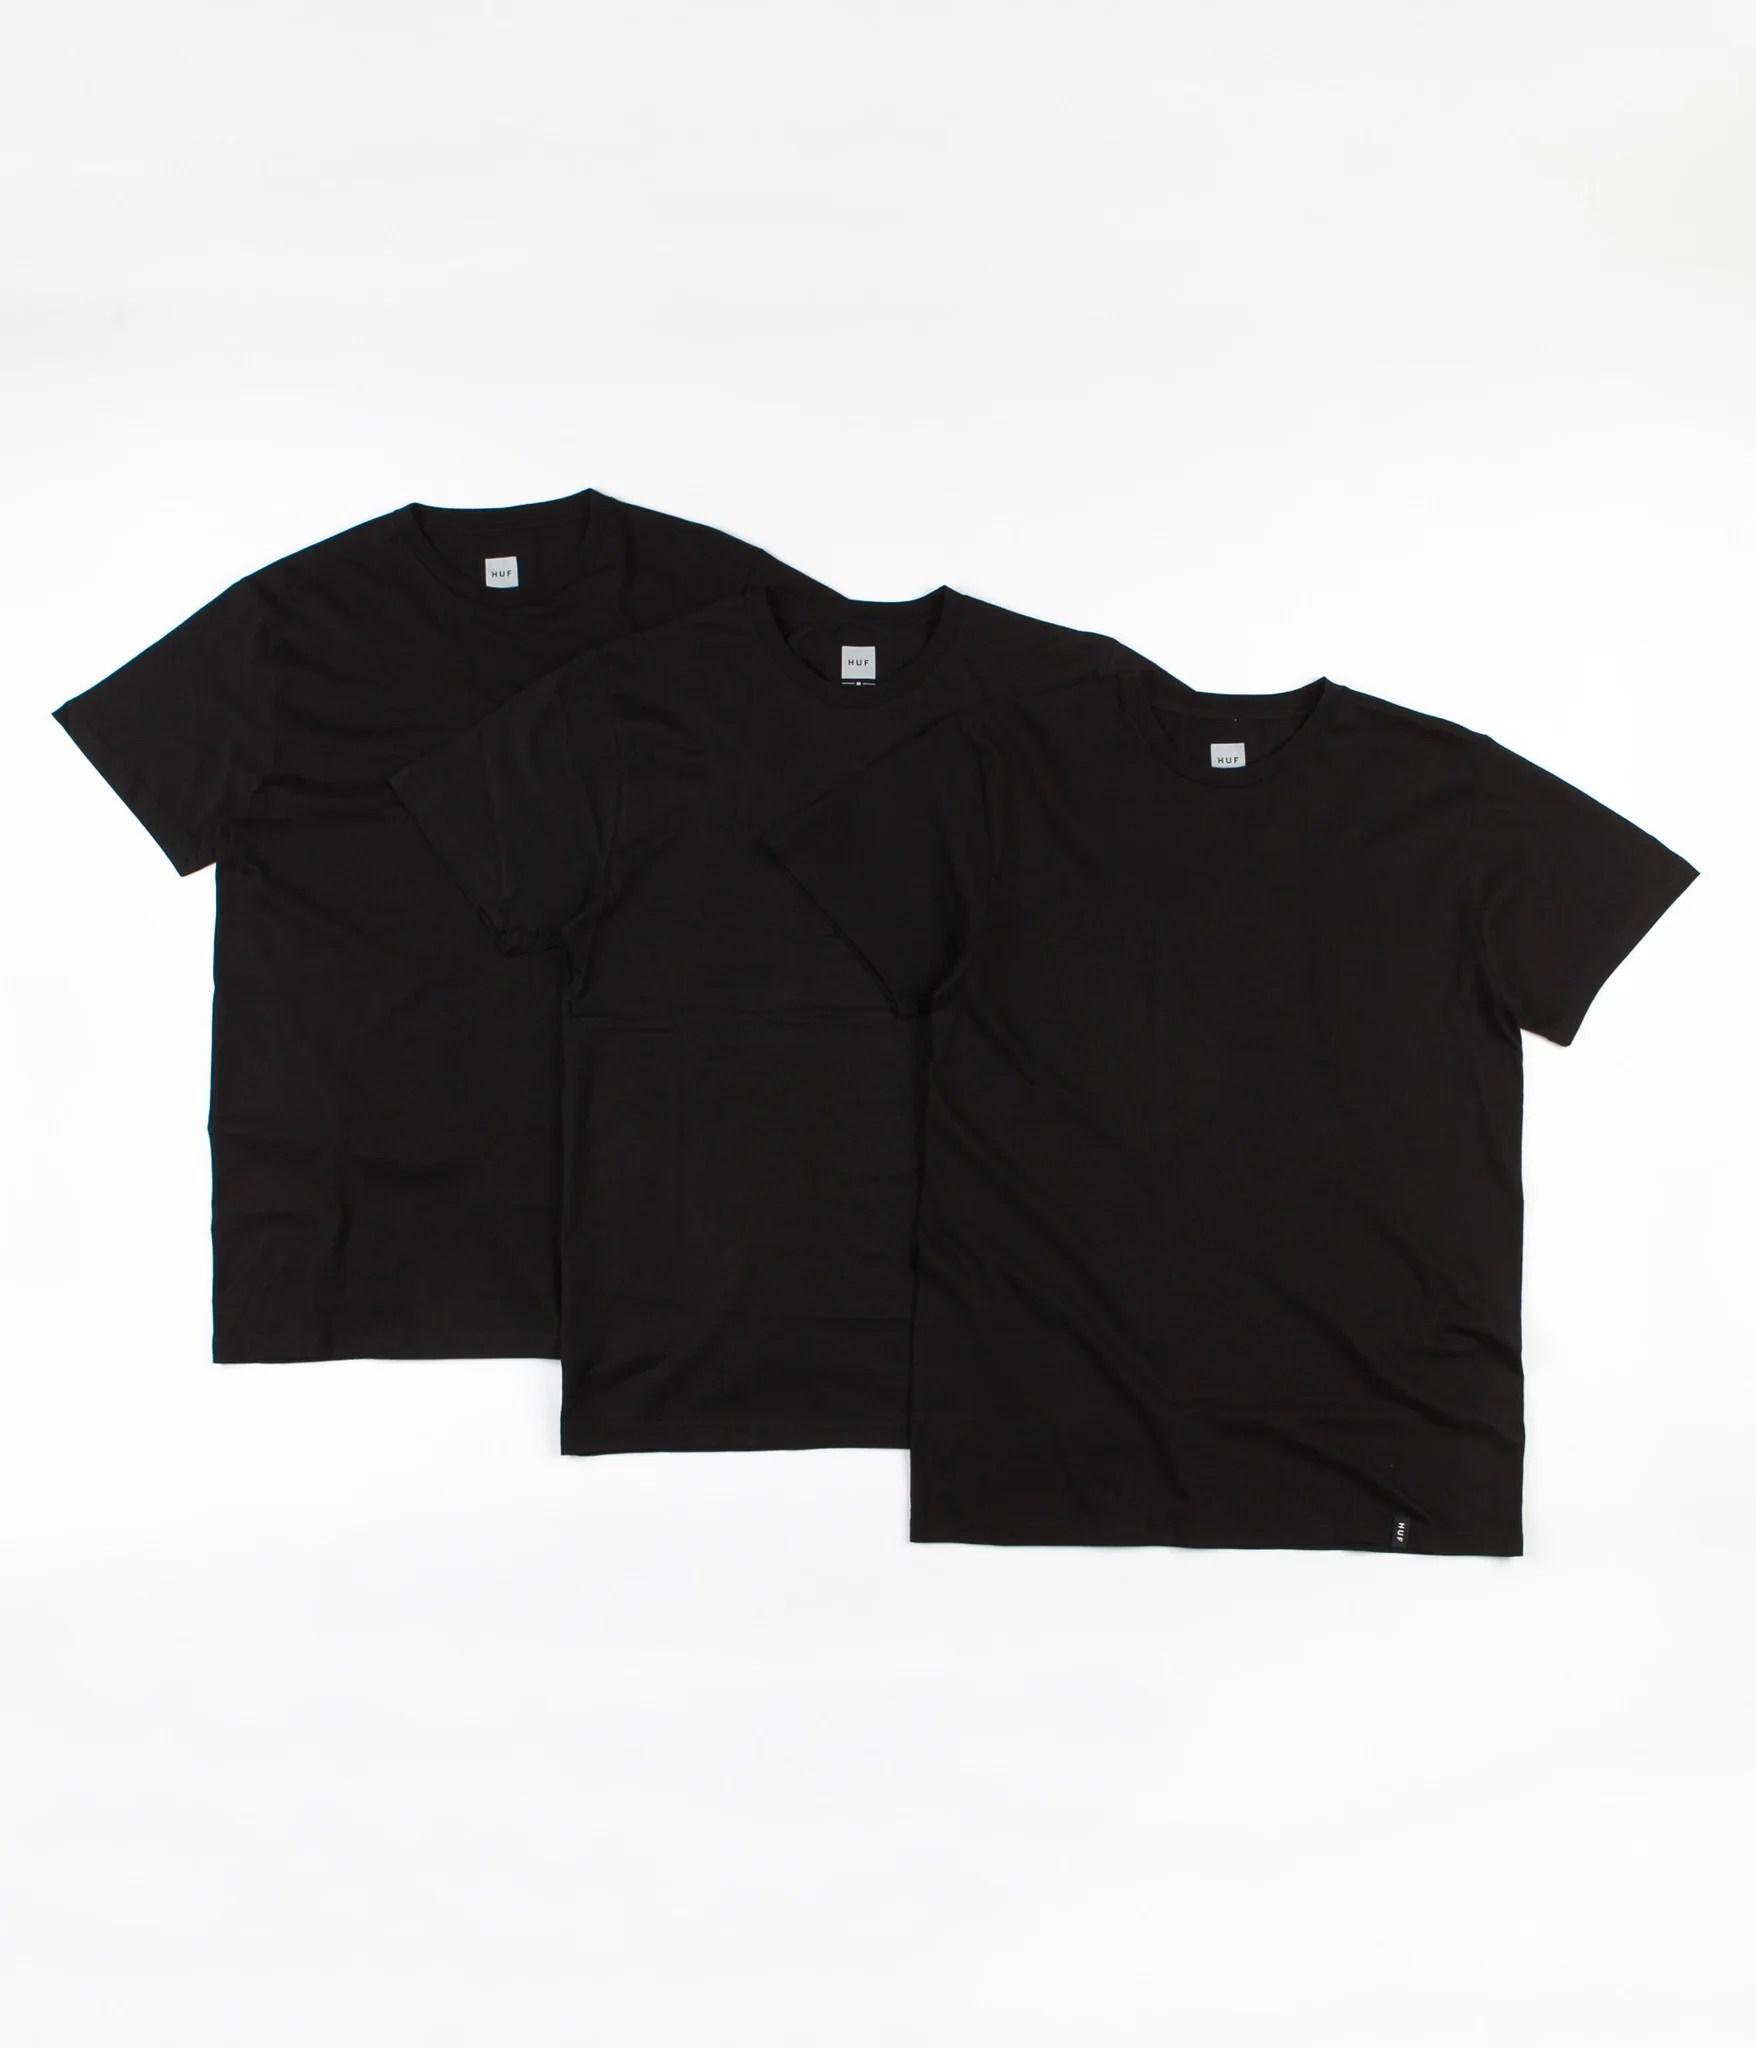 huf t shirt three pack black